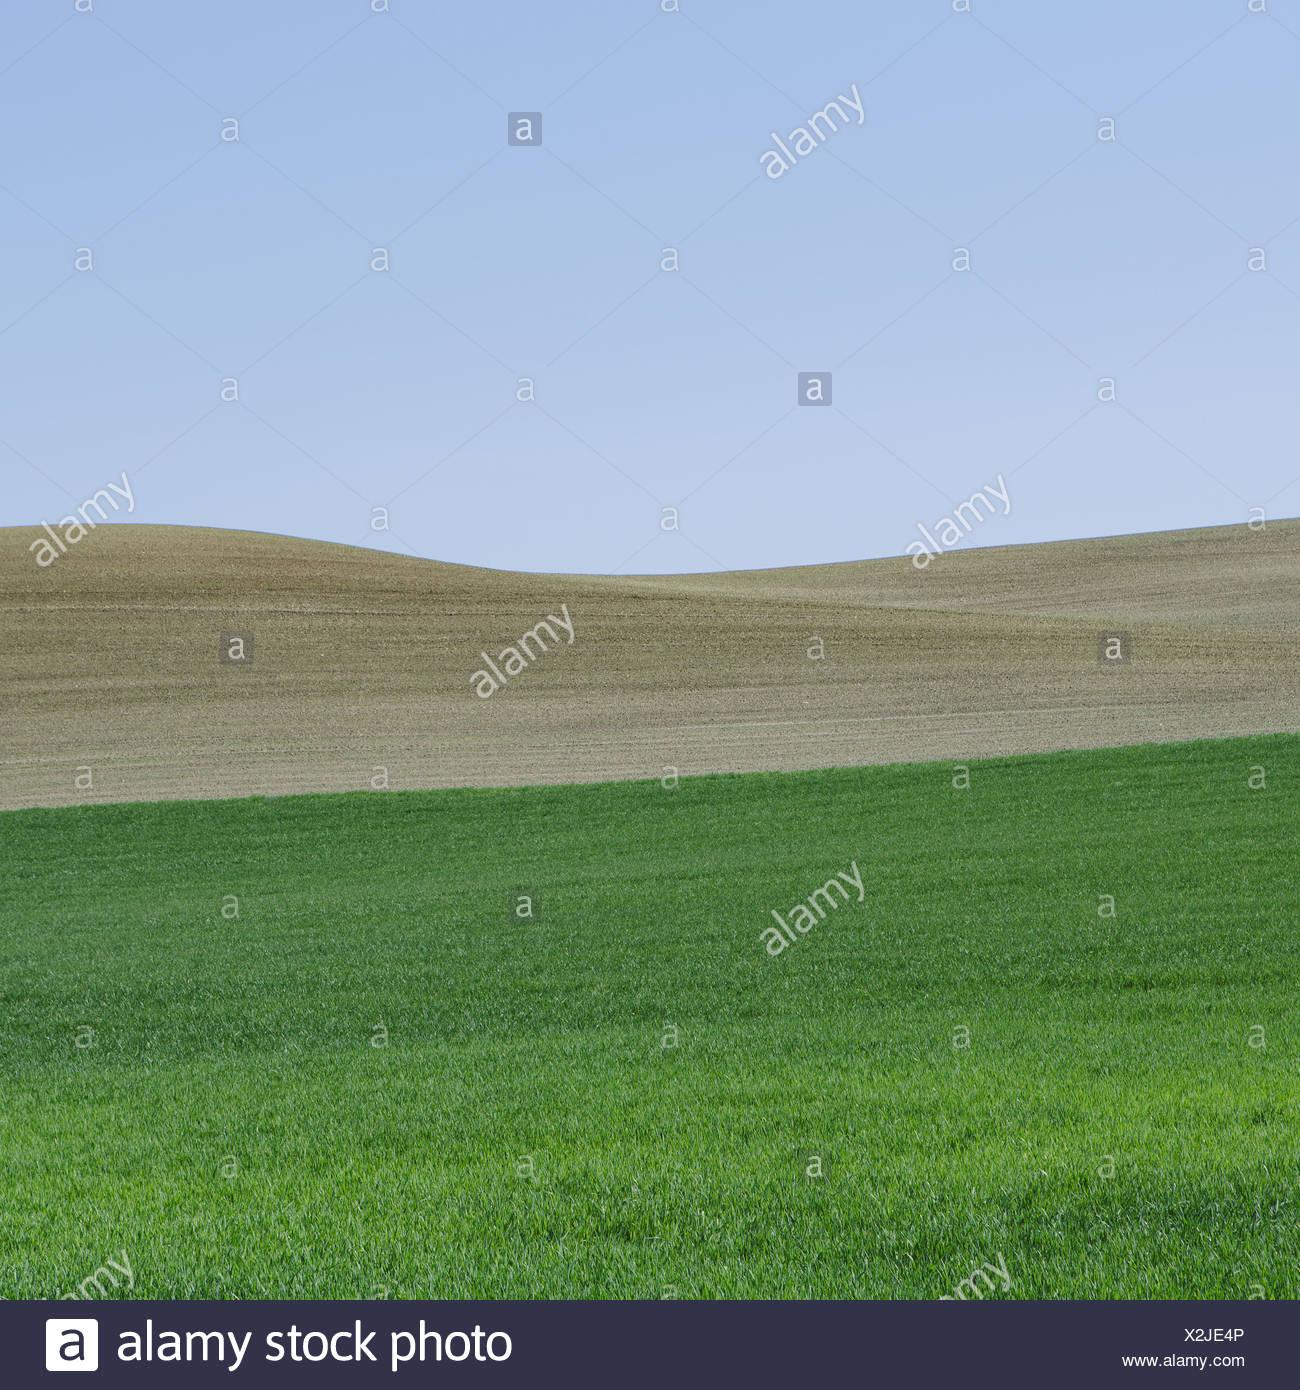 Lush, green rolling hills of the farmland near Pullman, Washington USA. A field of green ripening wheat crop plants. Stock Photo